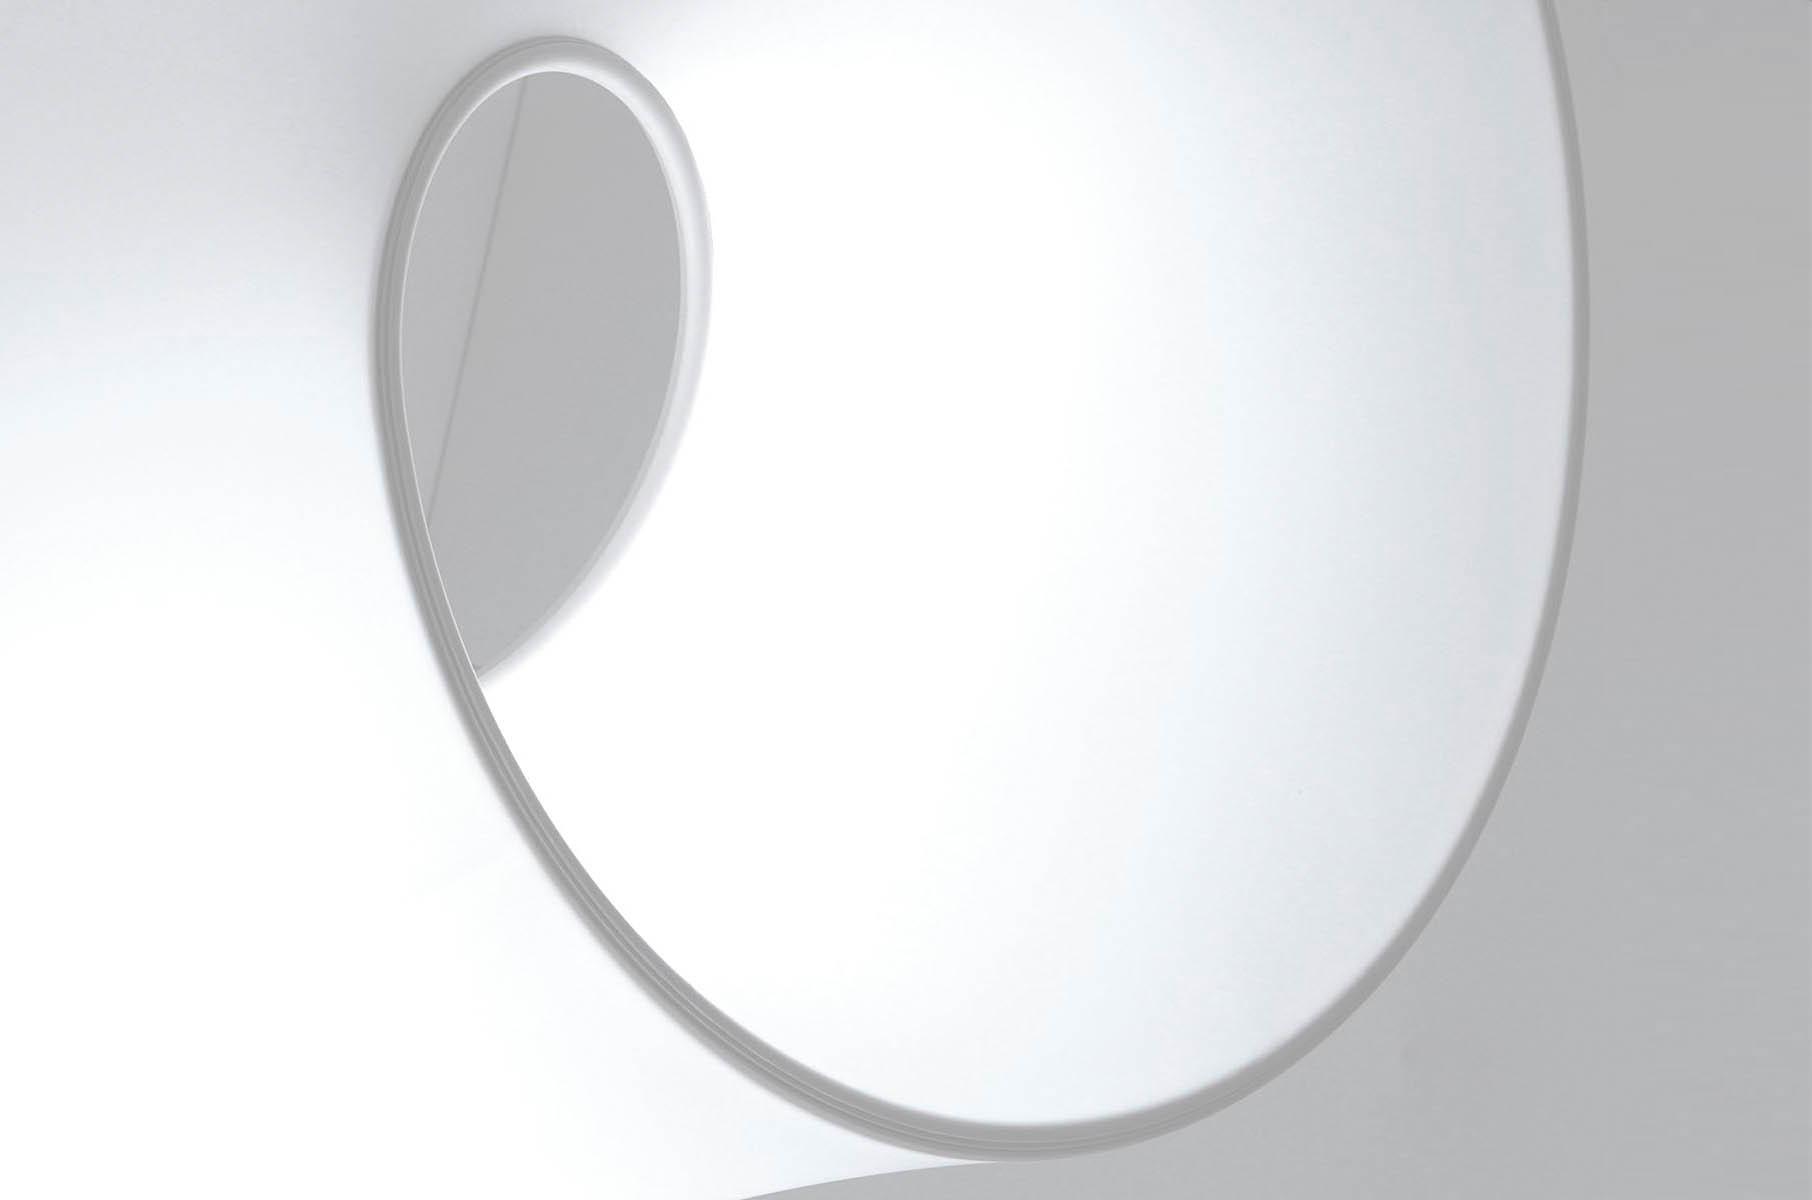 barrisol-infinite-loop-ross-lovegrove-computational-design-andrea-locatelli-06.jpg